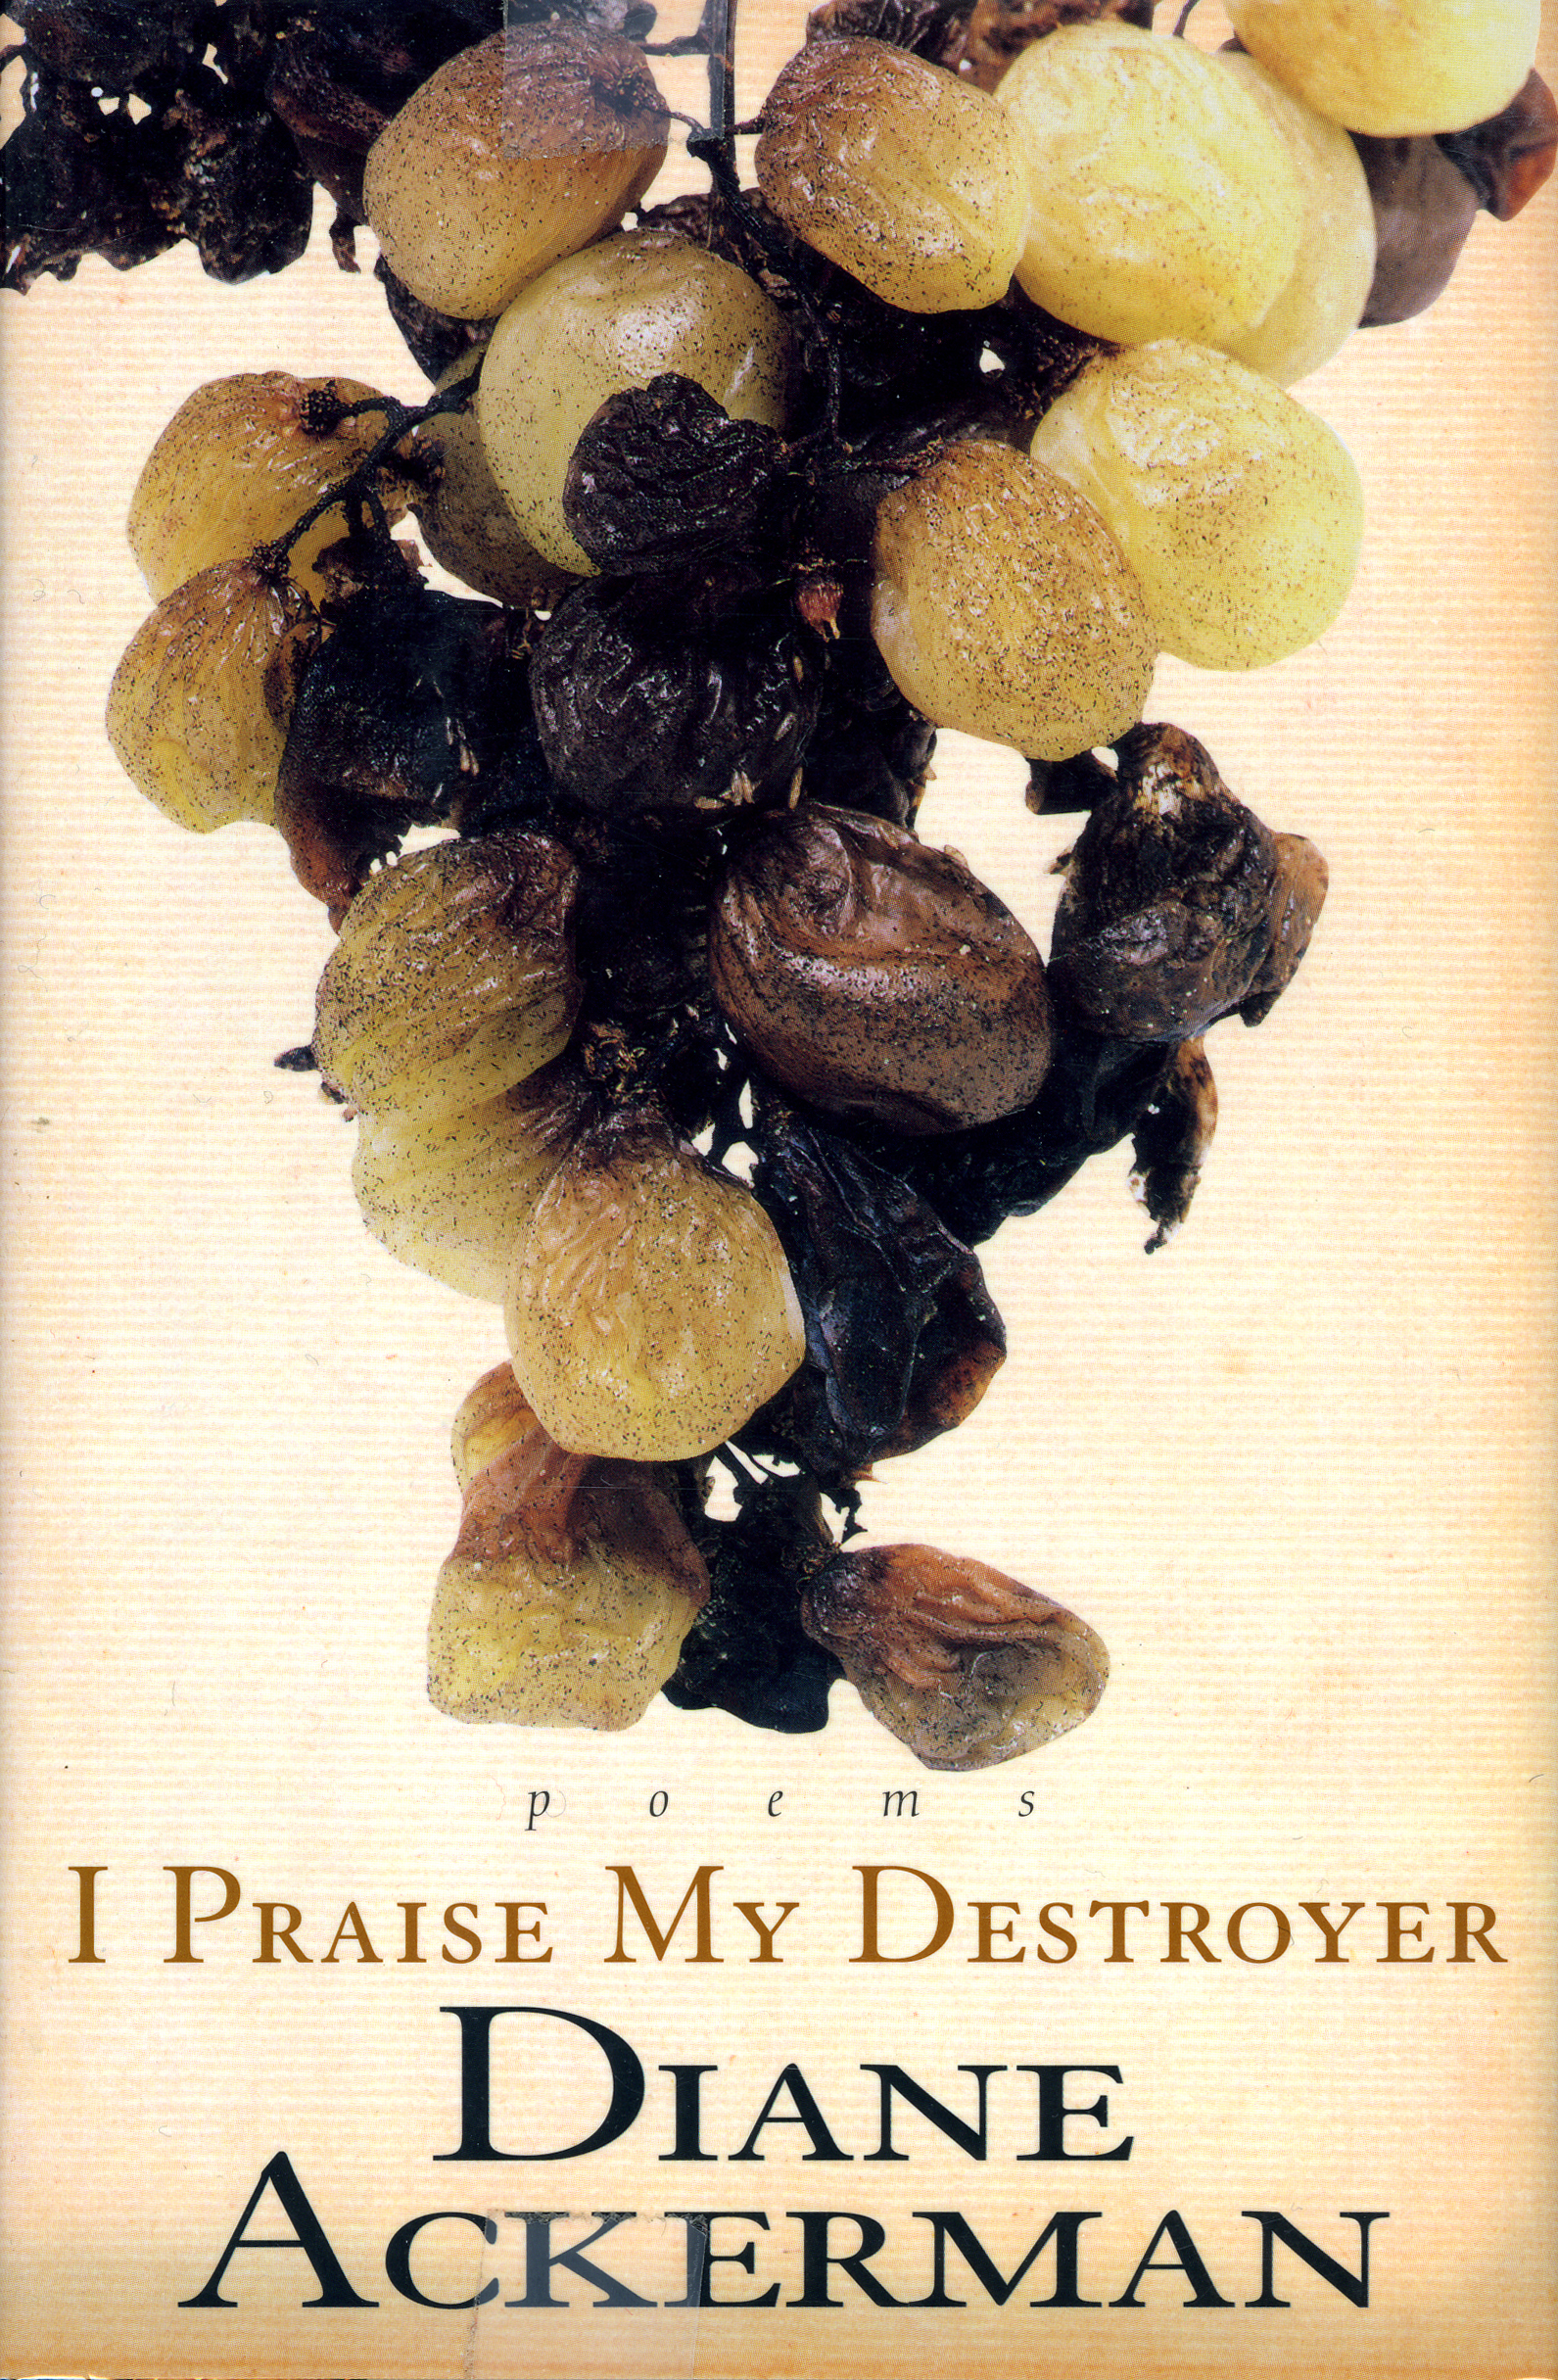 I Praise My Destroyer by Diane Ackerman